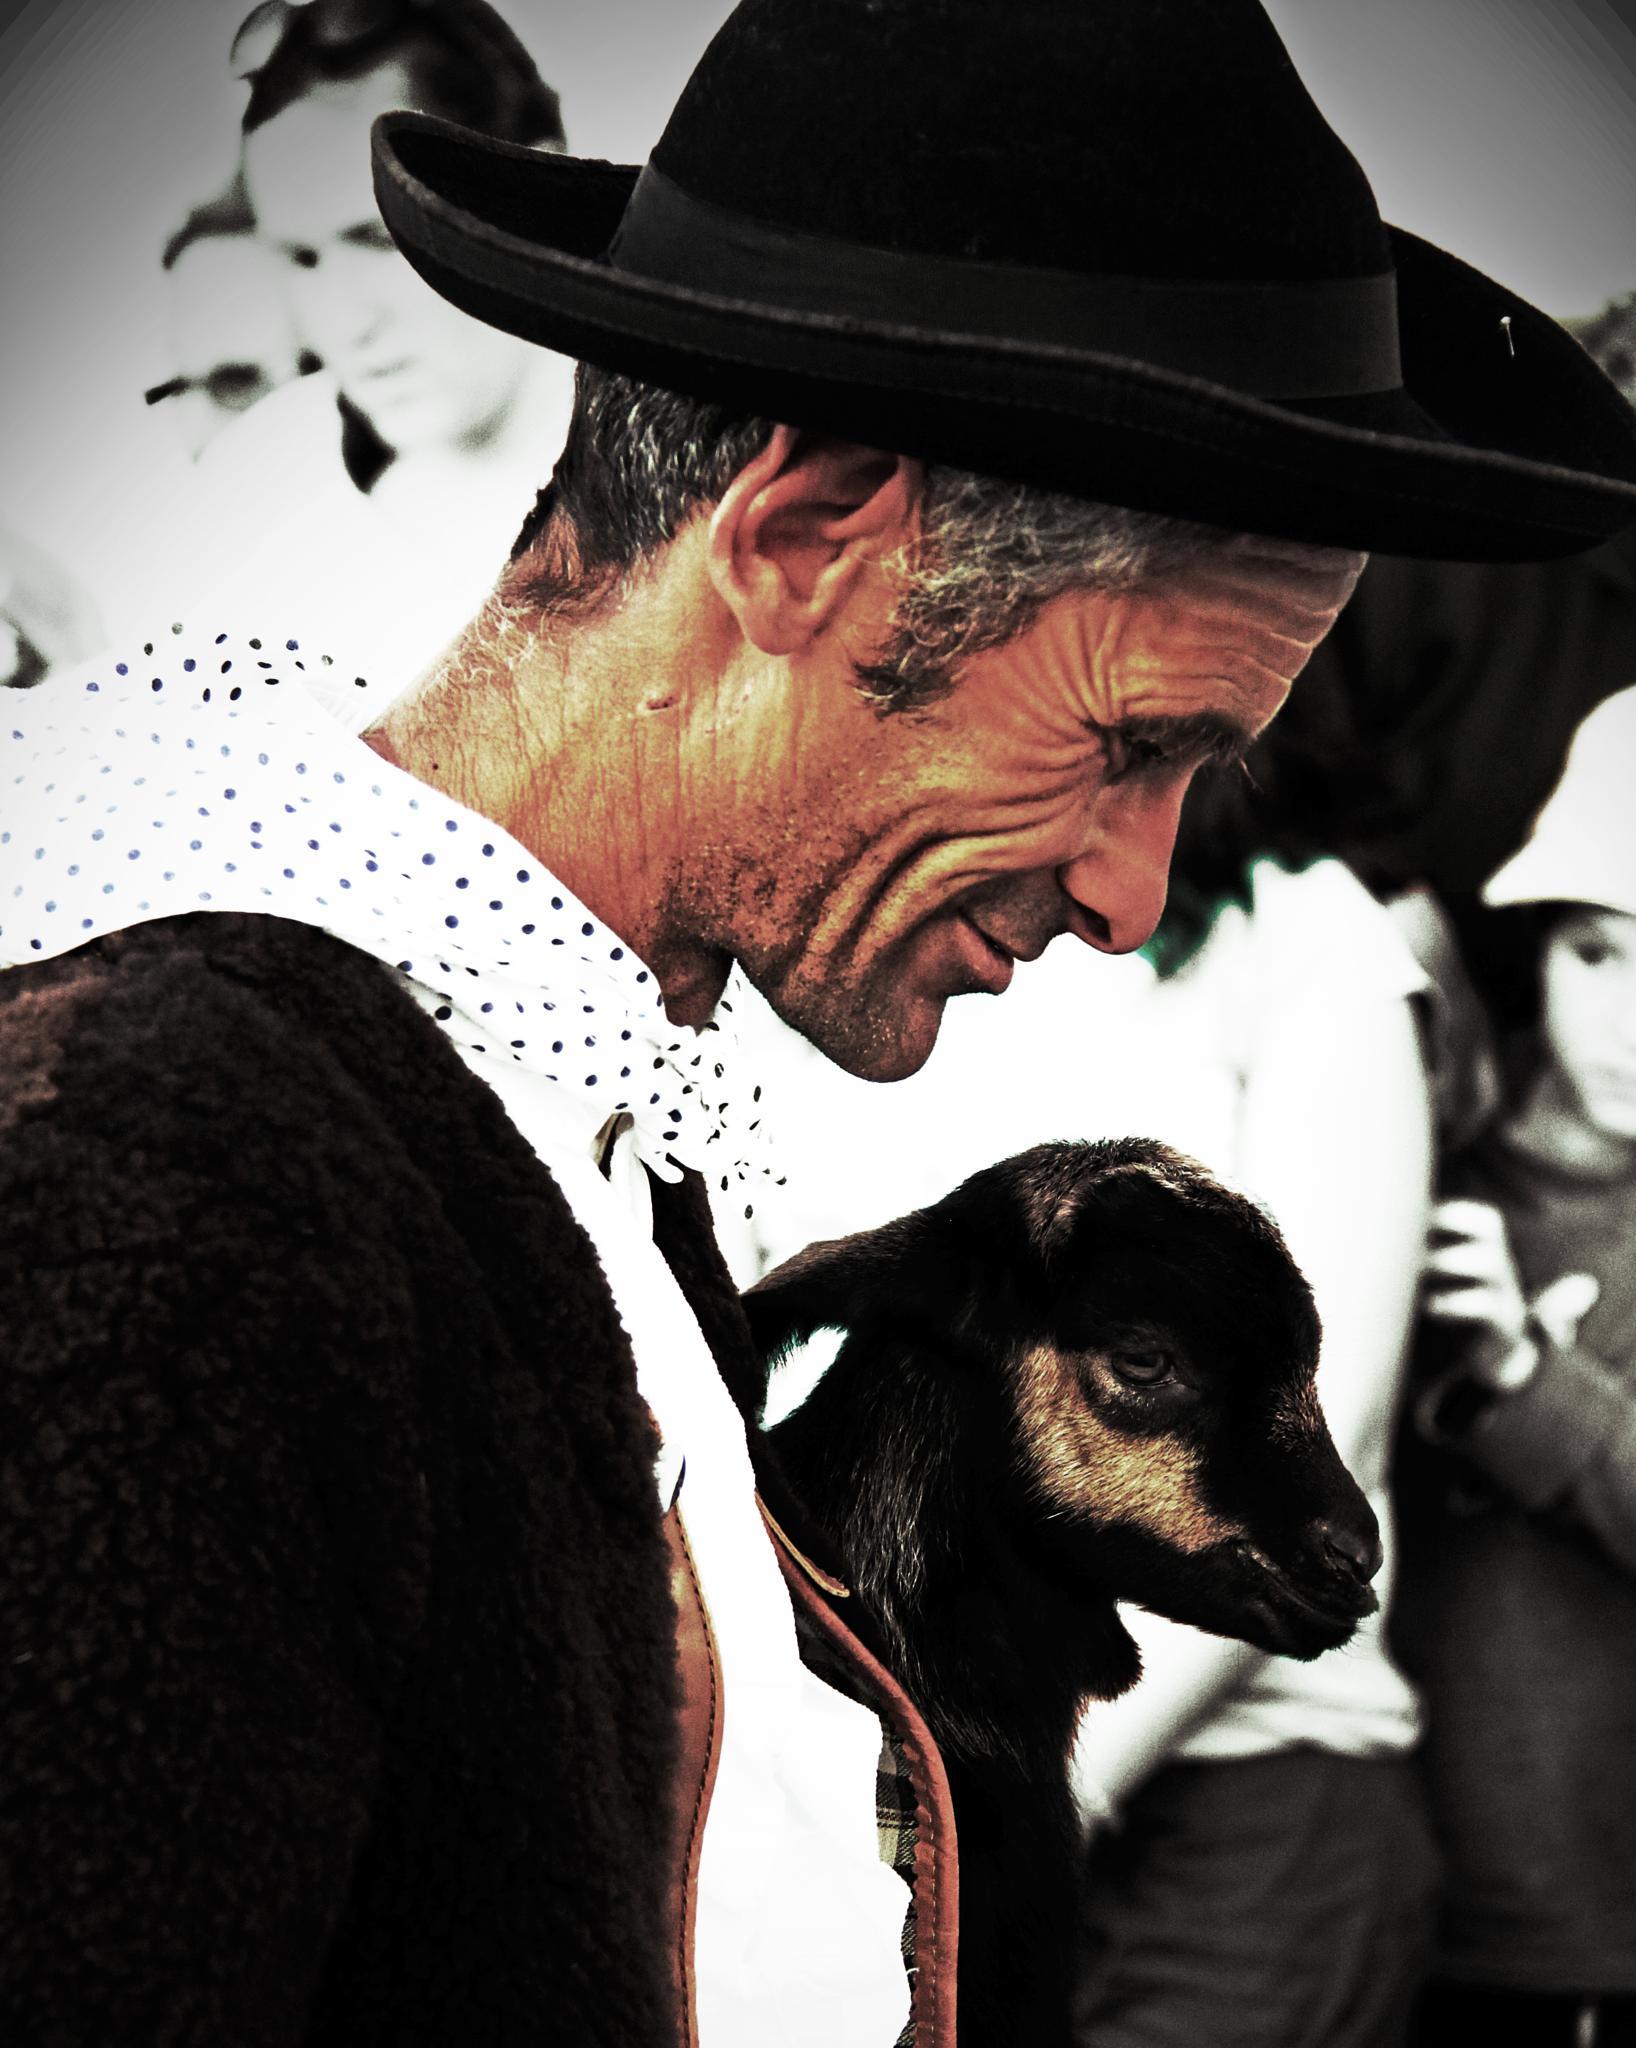 Goat Shepherd by antoniojppereira